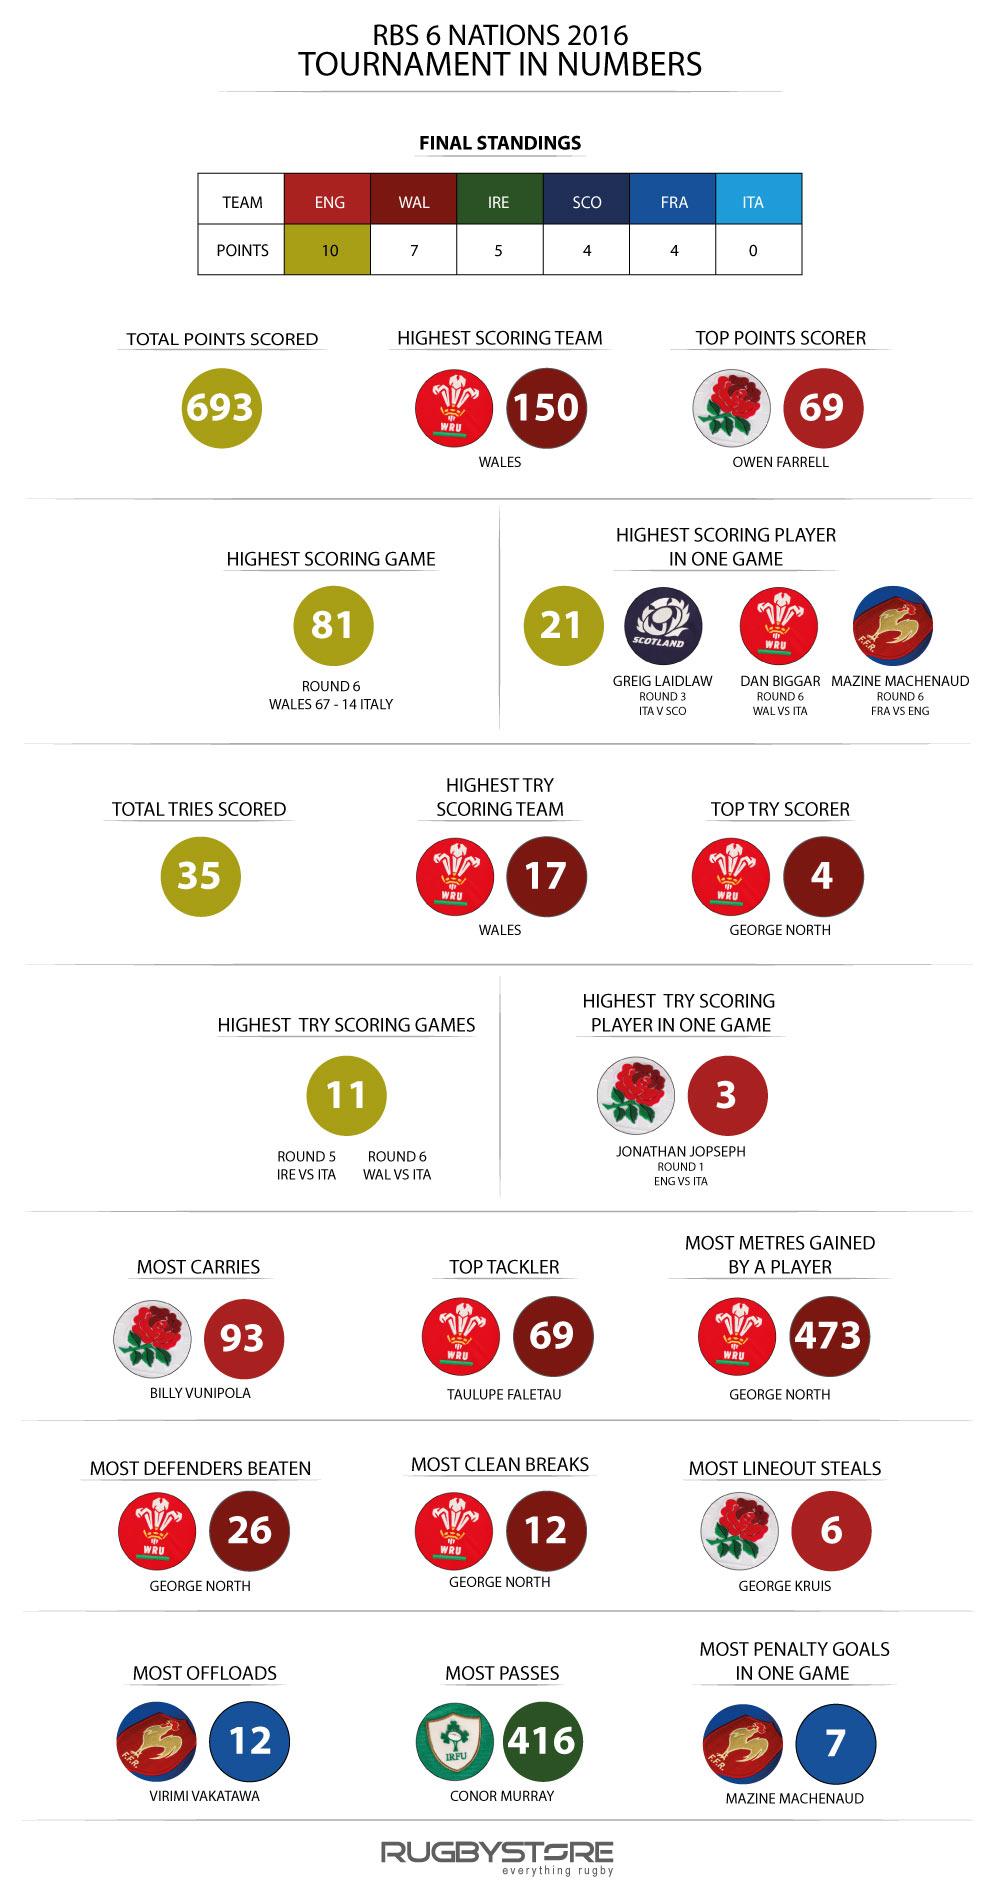 6-Nations-2016-tournament-infogrpahic